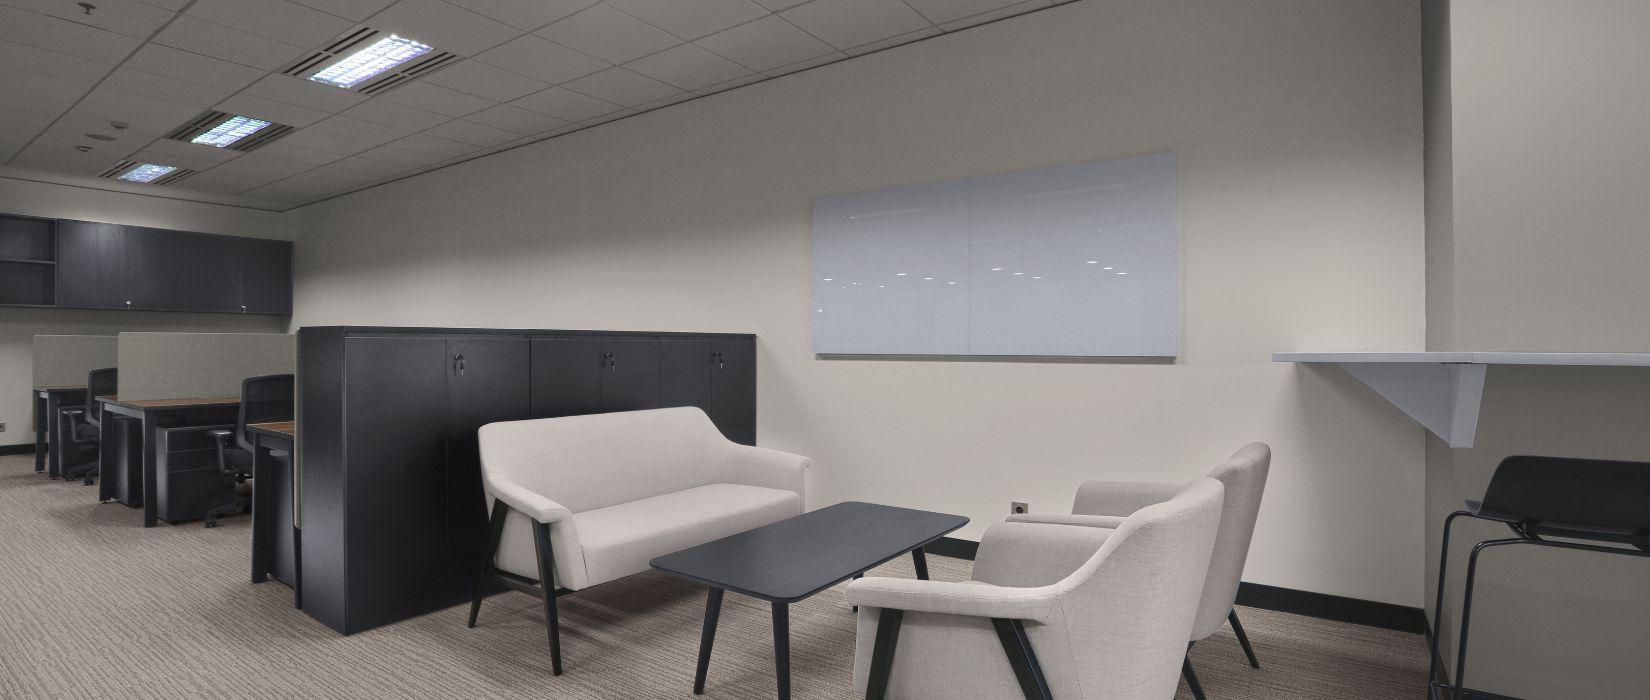 09. Office_Suite_1_Sitting_Area